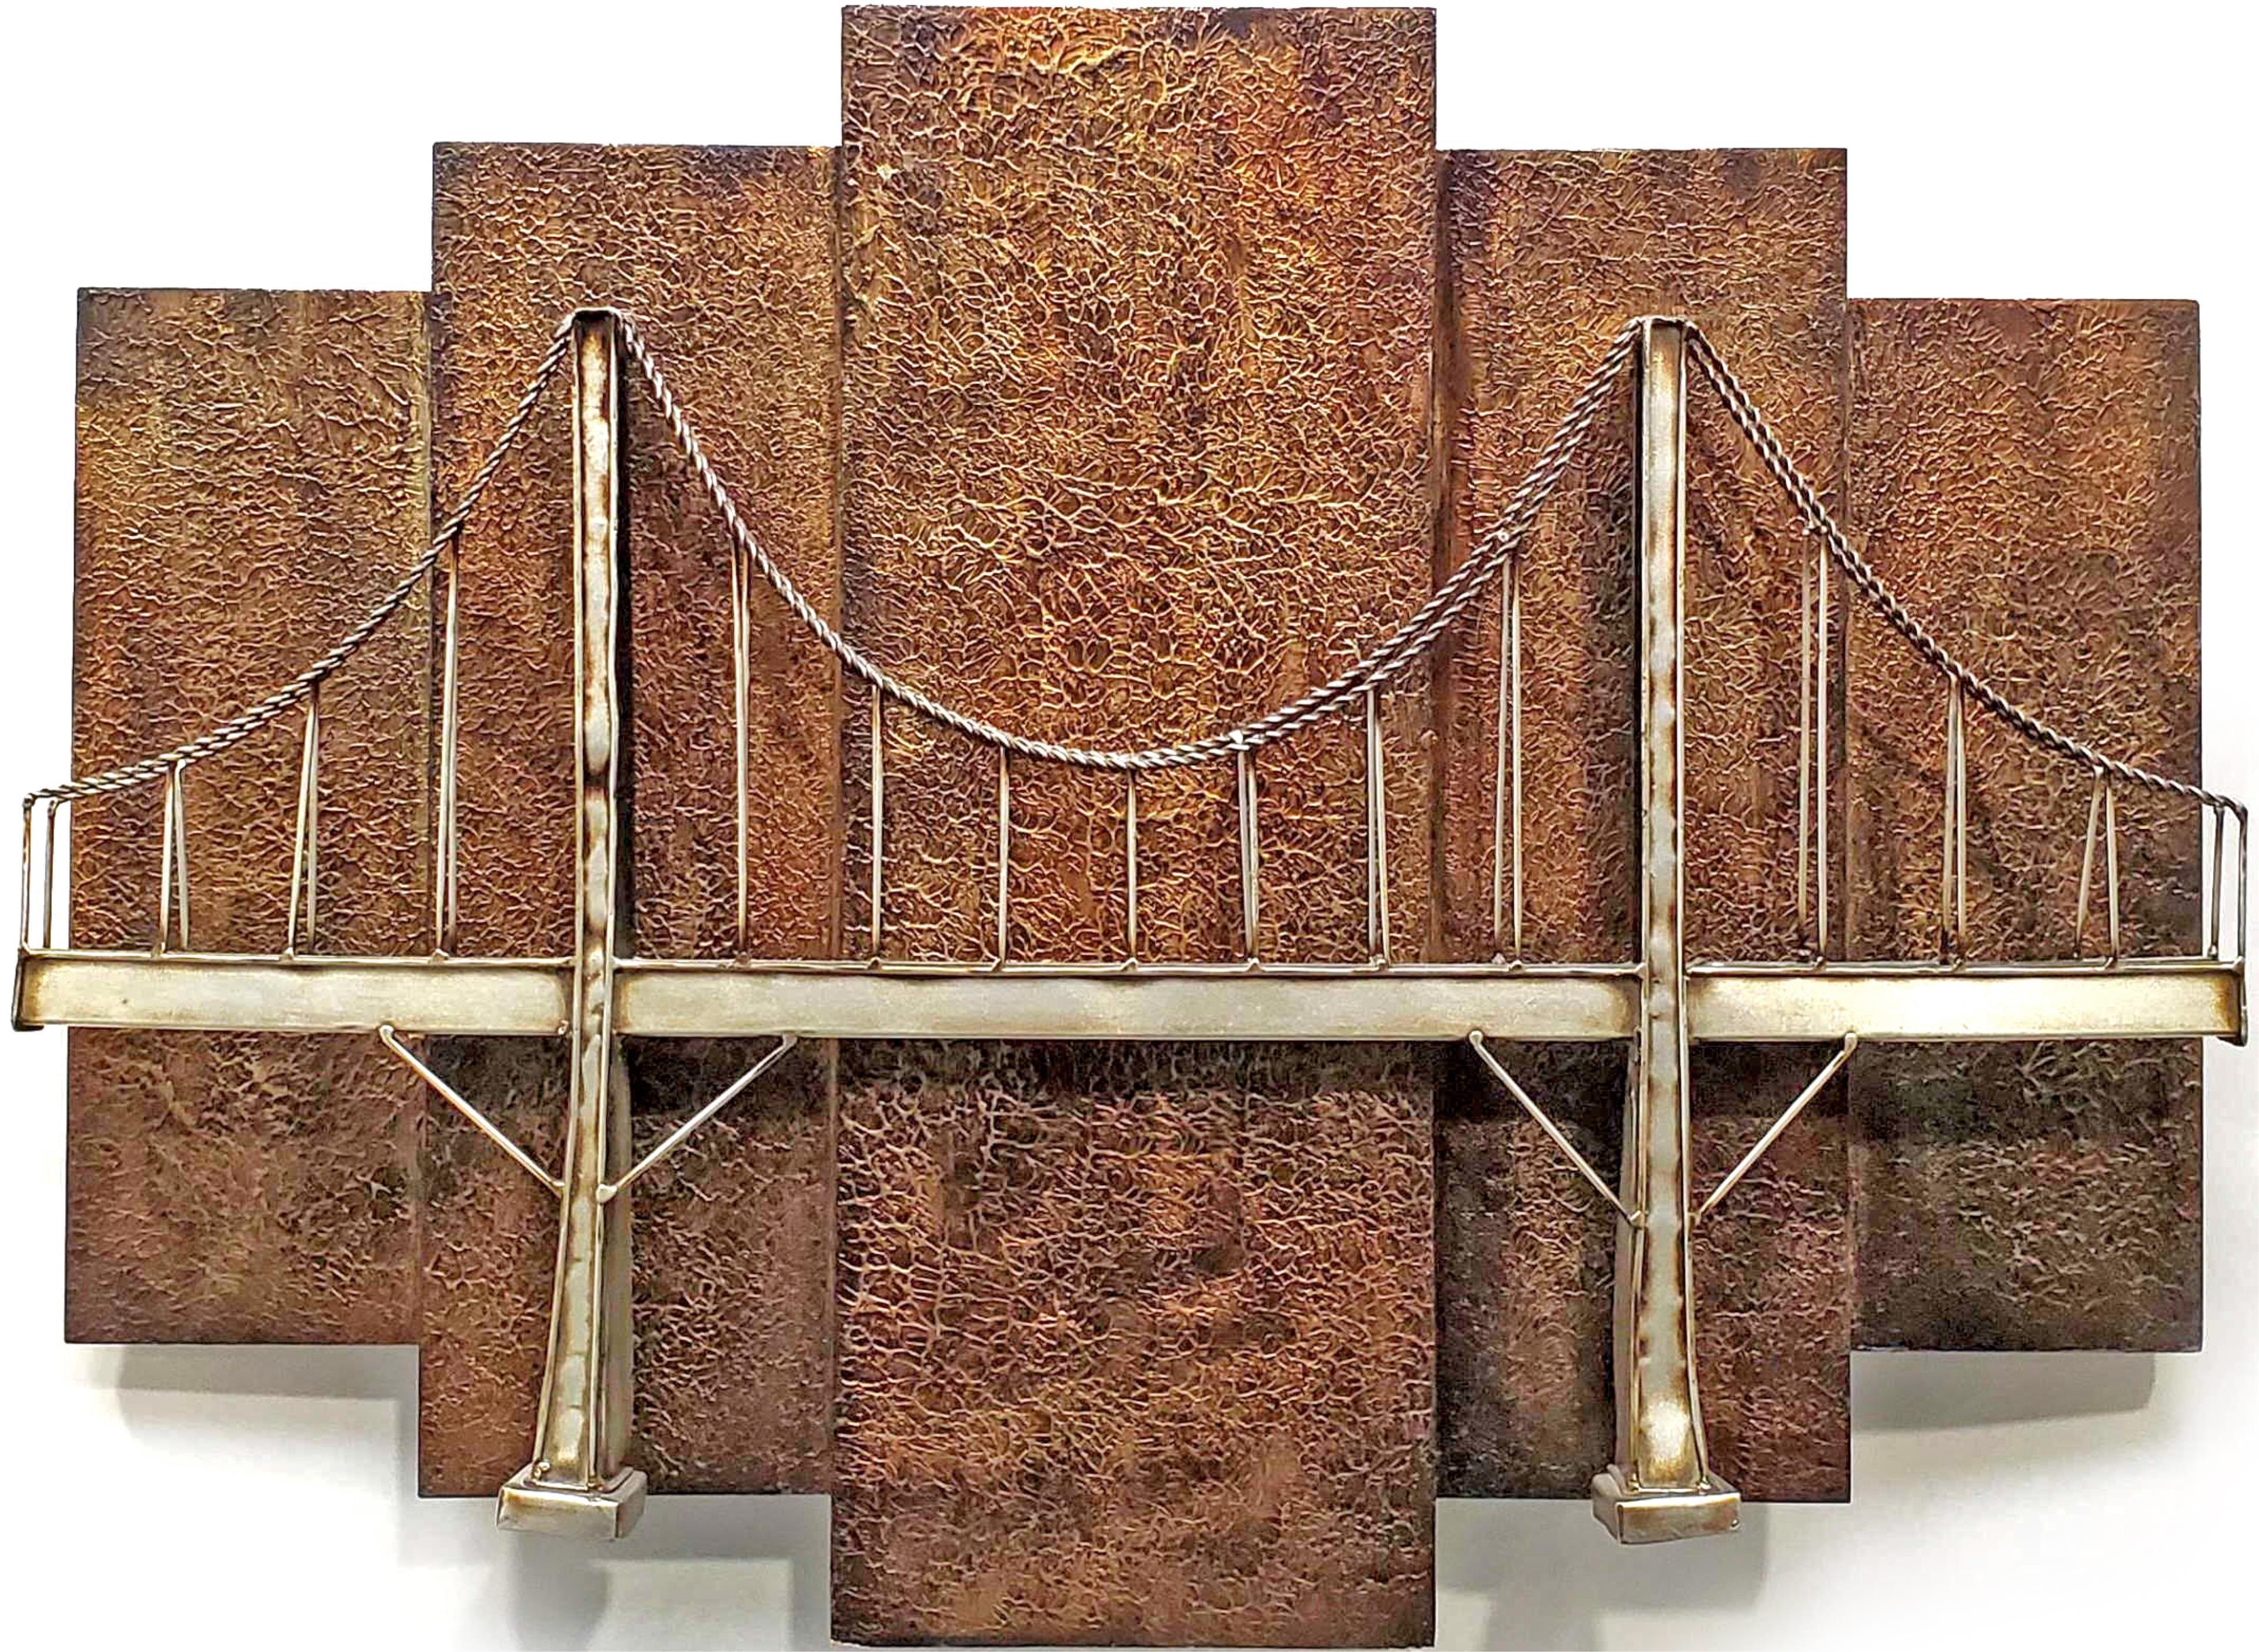 Metal Golden Gate Suspension Bridge Wall Art